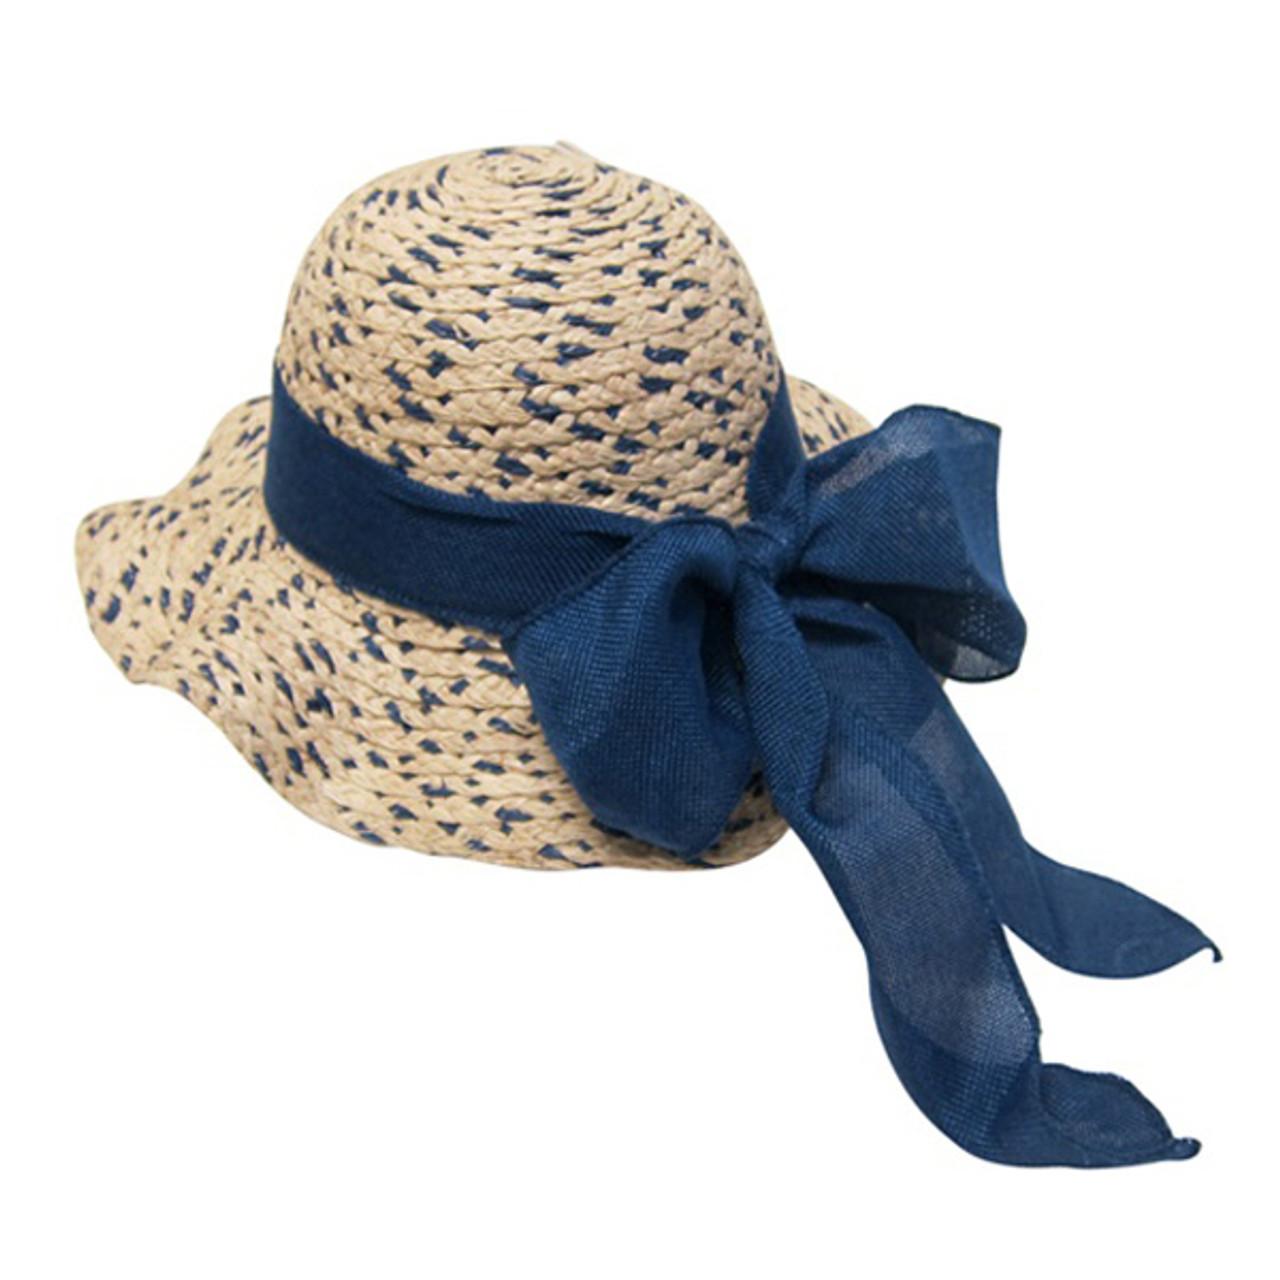 c017dec8e Boardwalk Style - Girls Raffia Straw Sun Hat